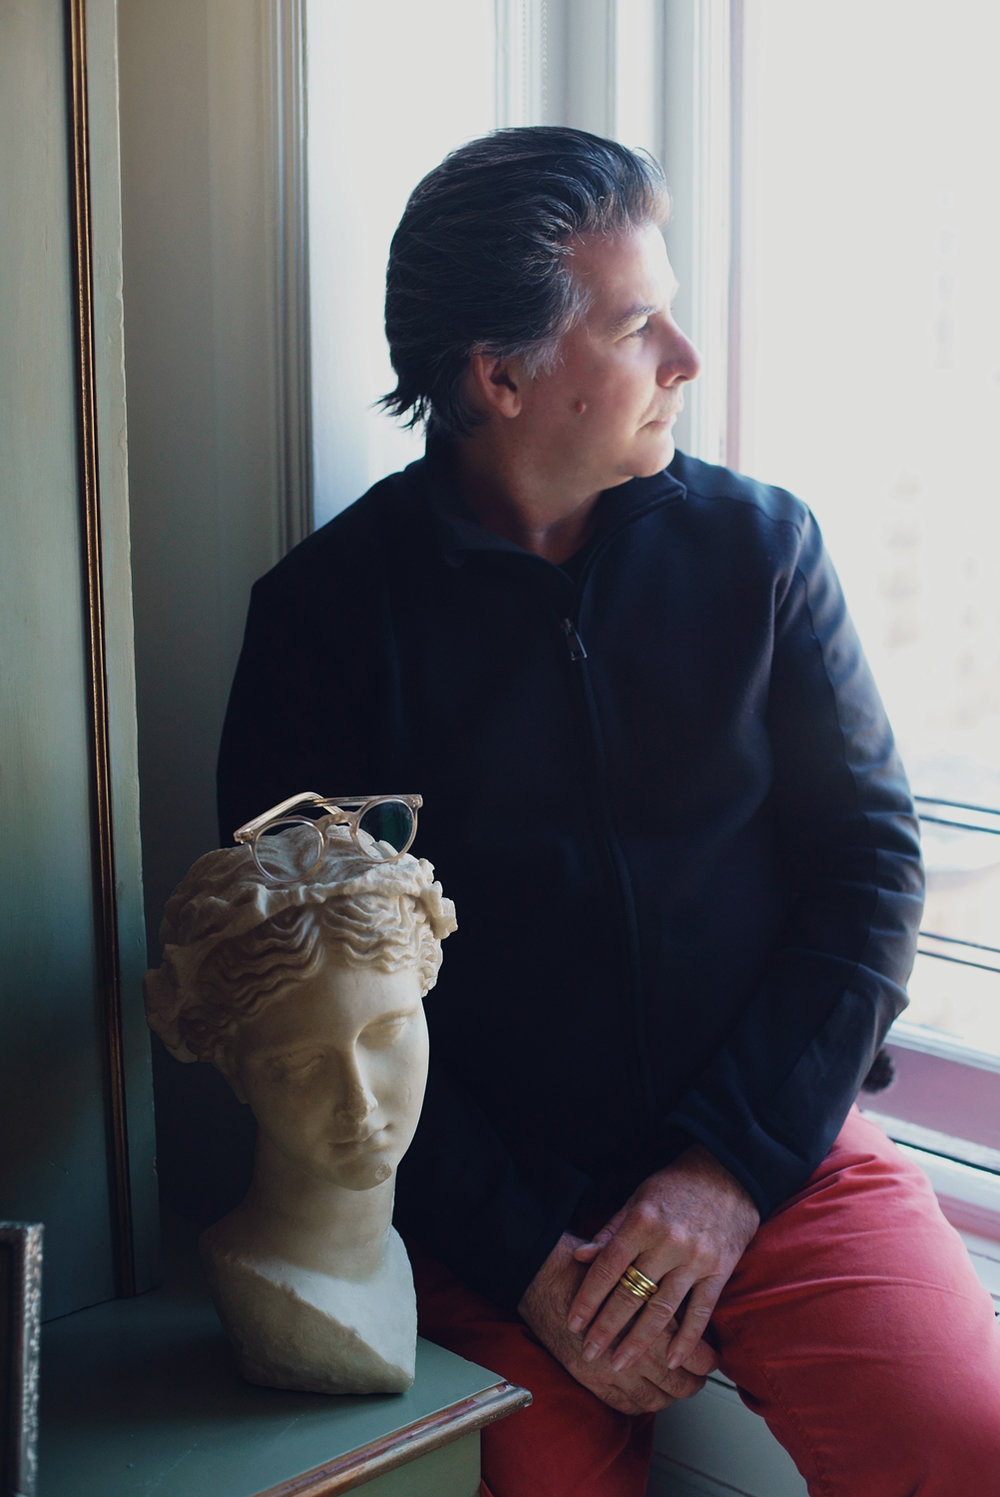 david-thornton-celebrity-portraits-katrina-eugenia-photography96.jpg